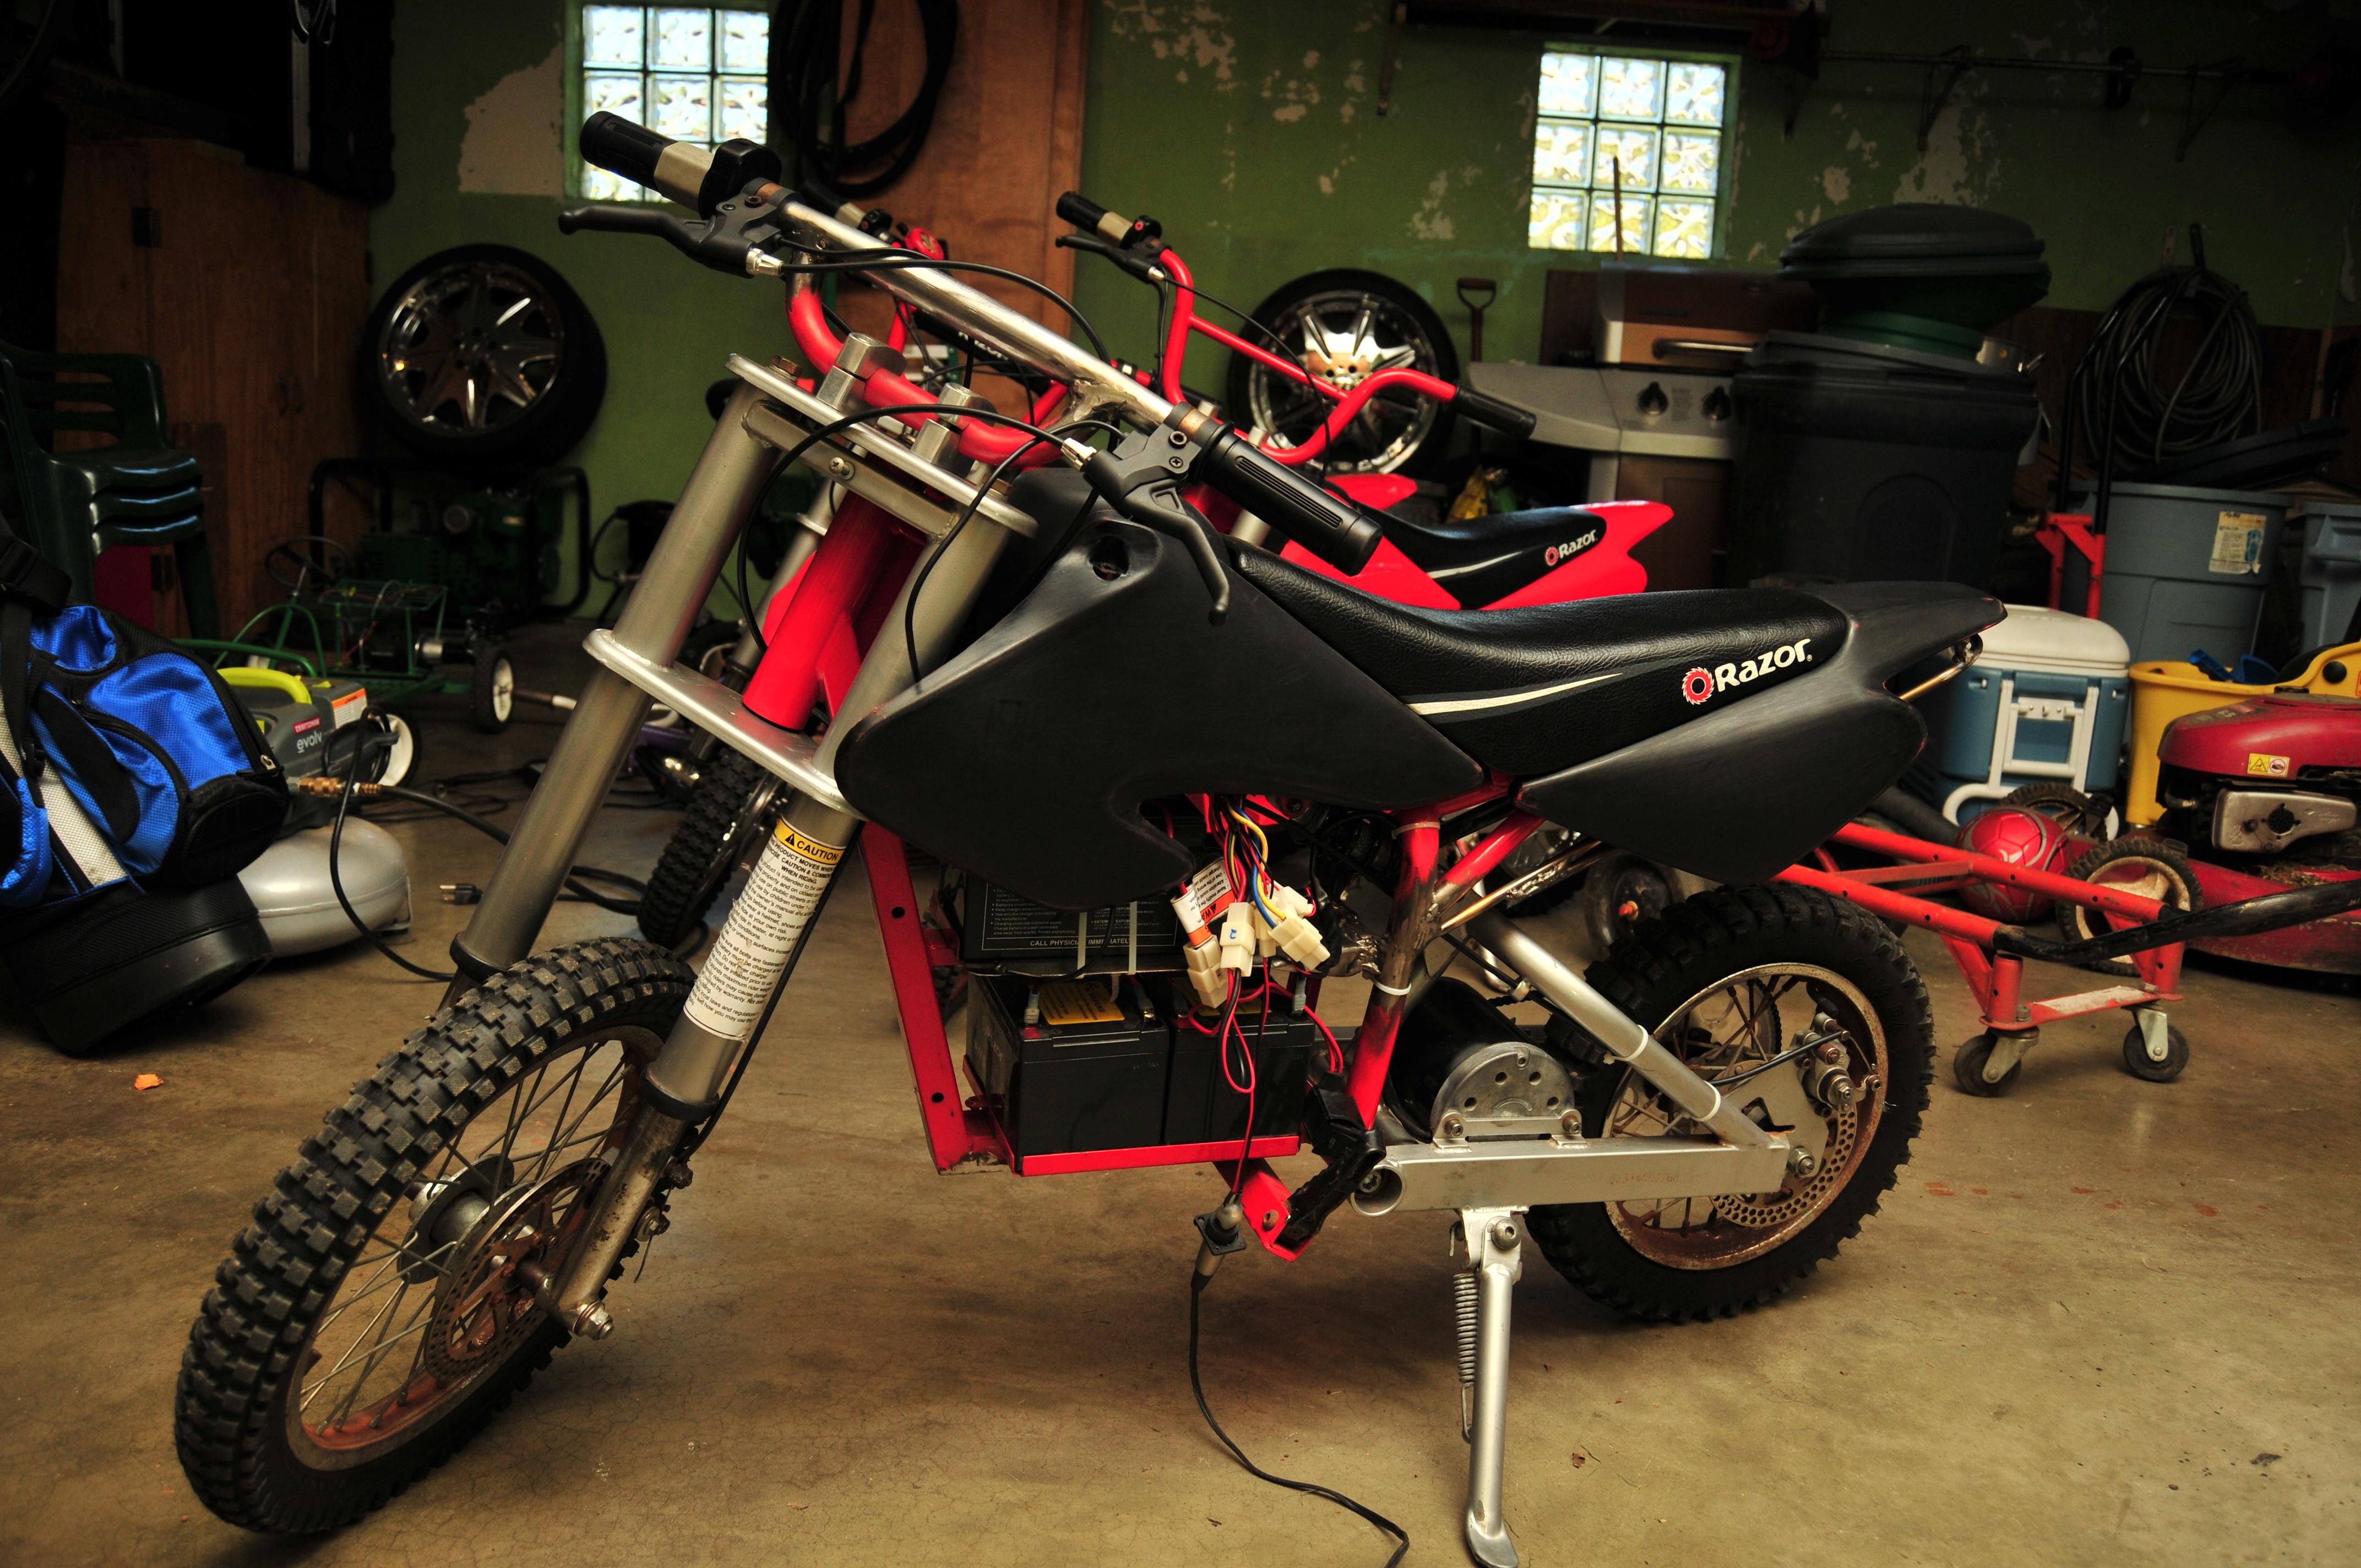 Razor Mx500 Electric Dirtbike Triton 9 Mx 650 Wiring Diagram I